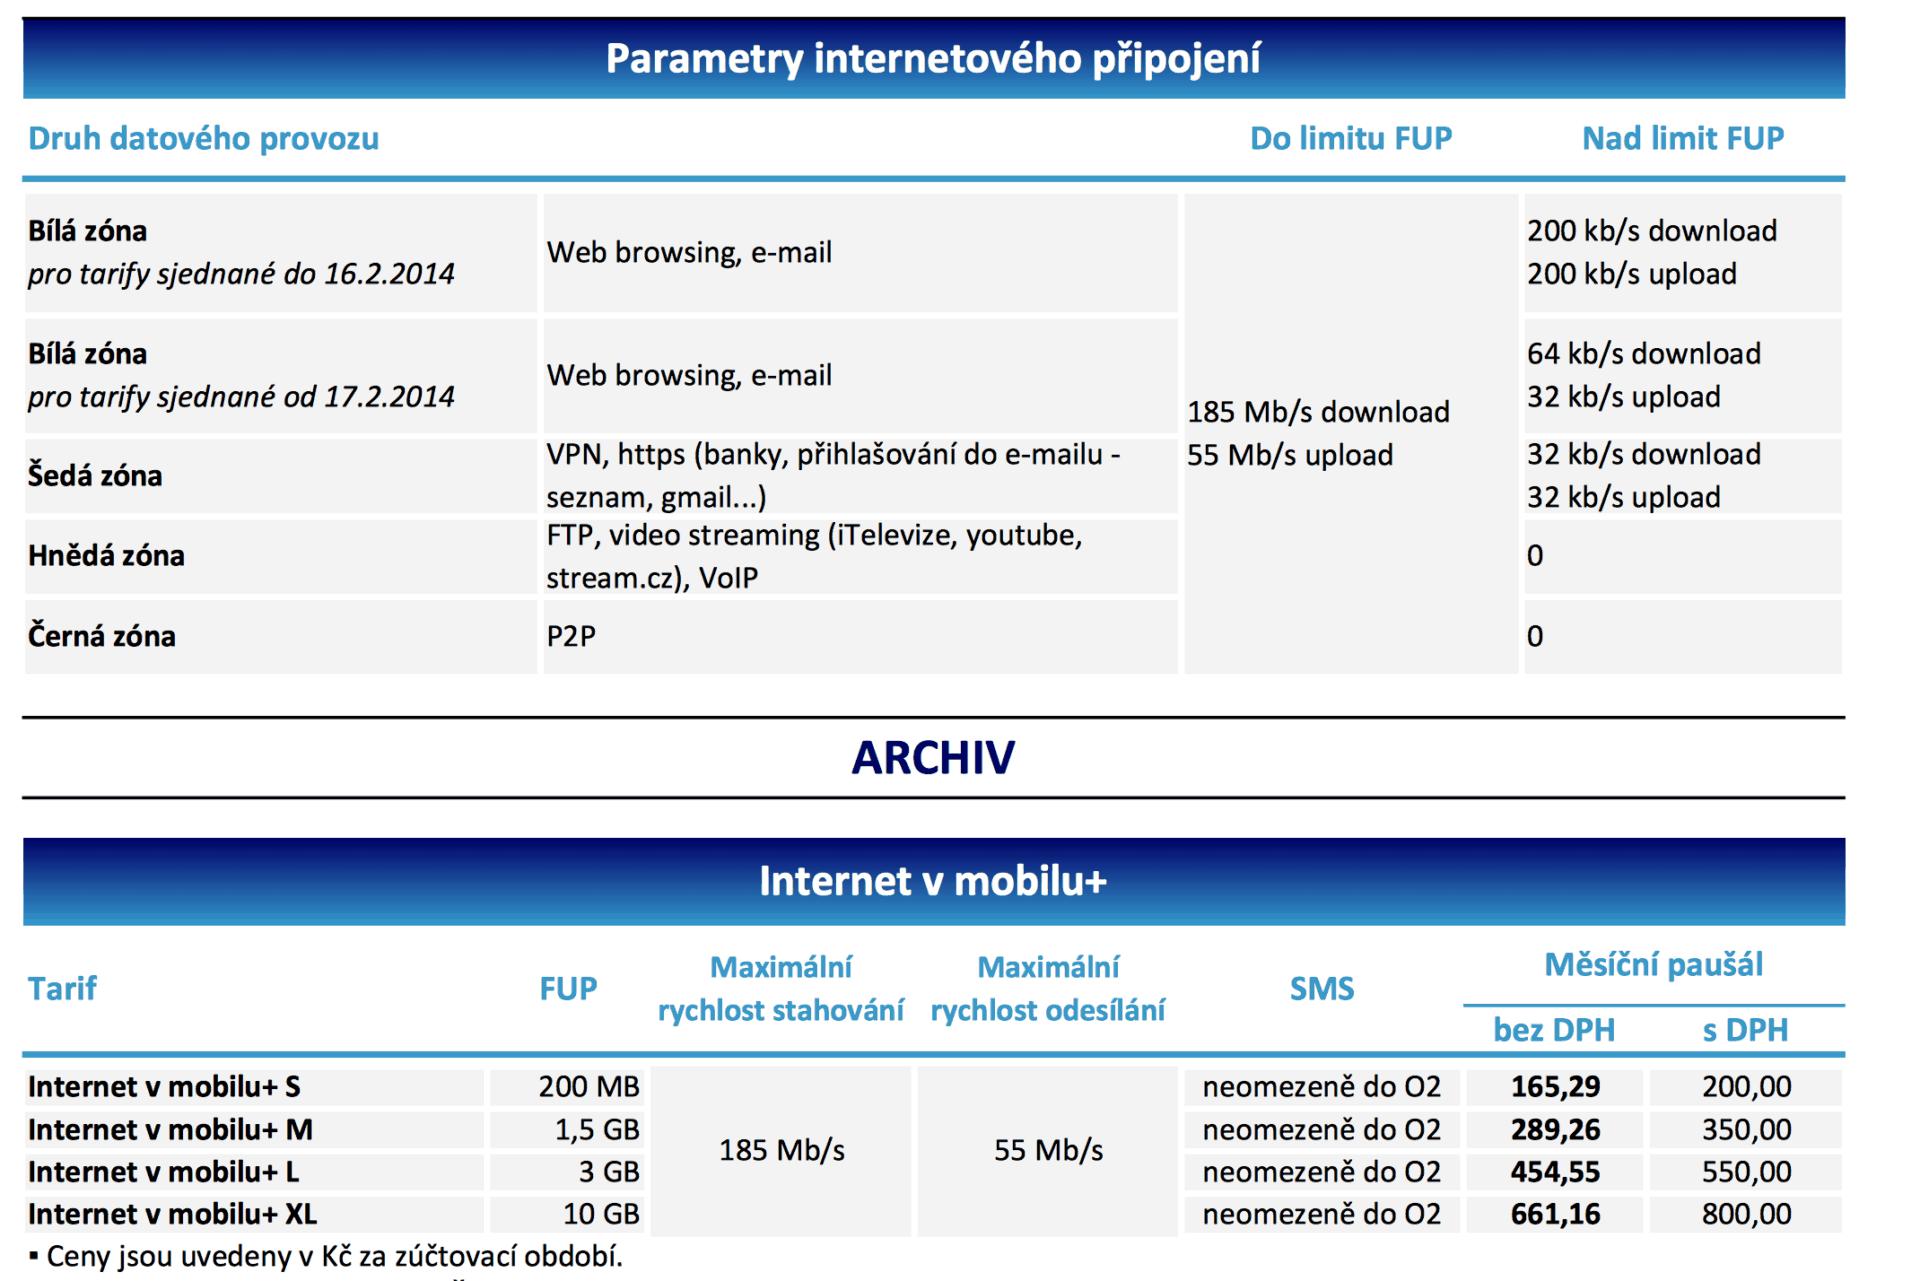 bez-fup-o2-specifikace-tarifu